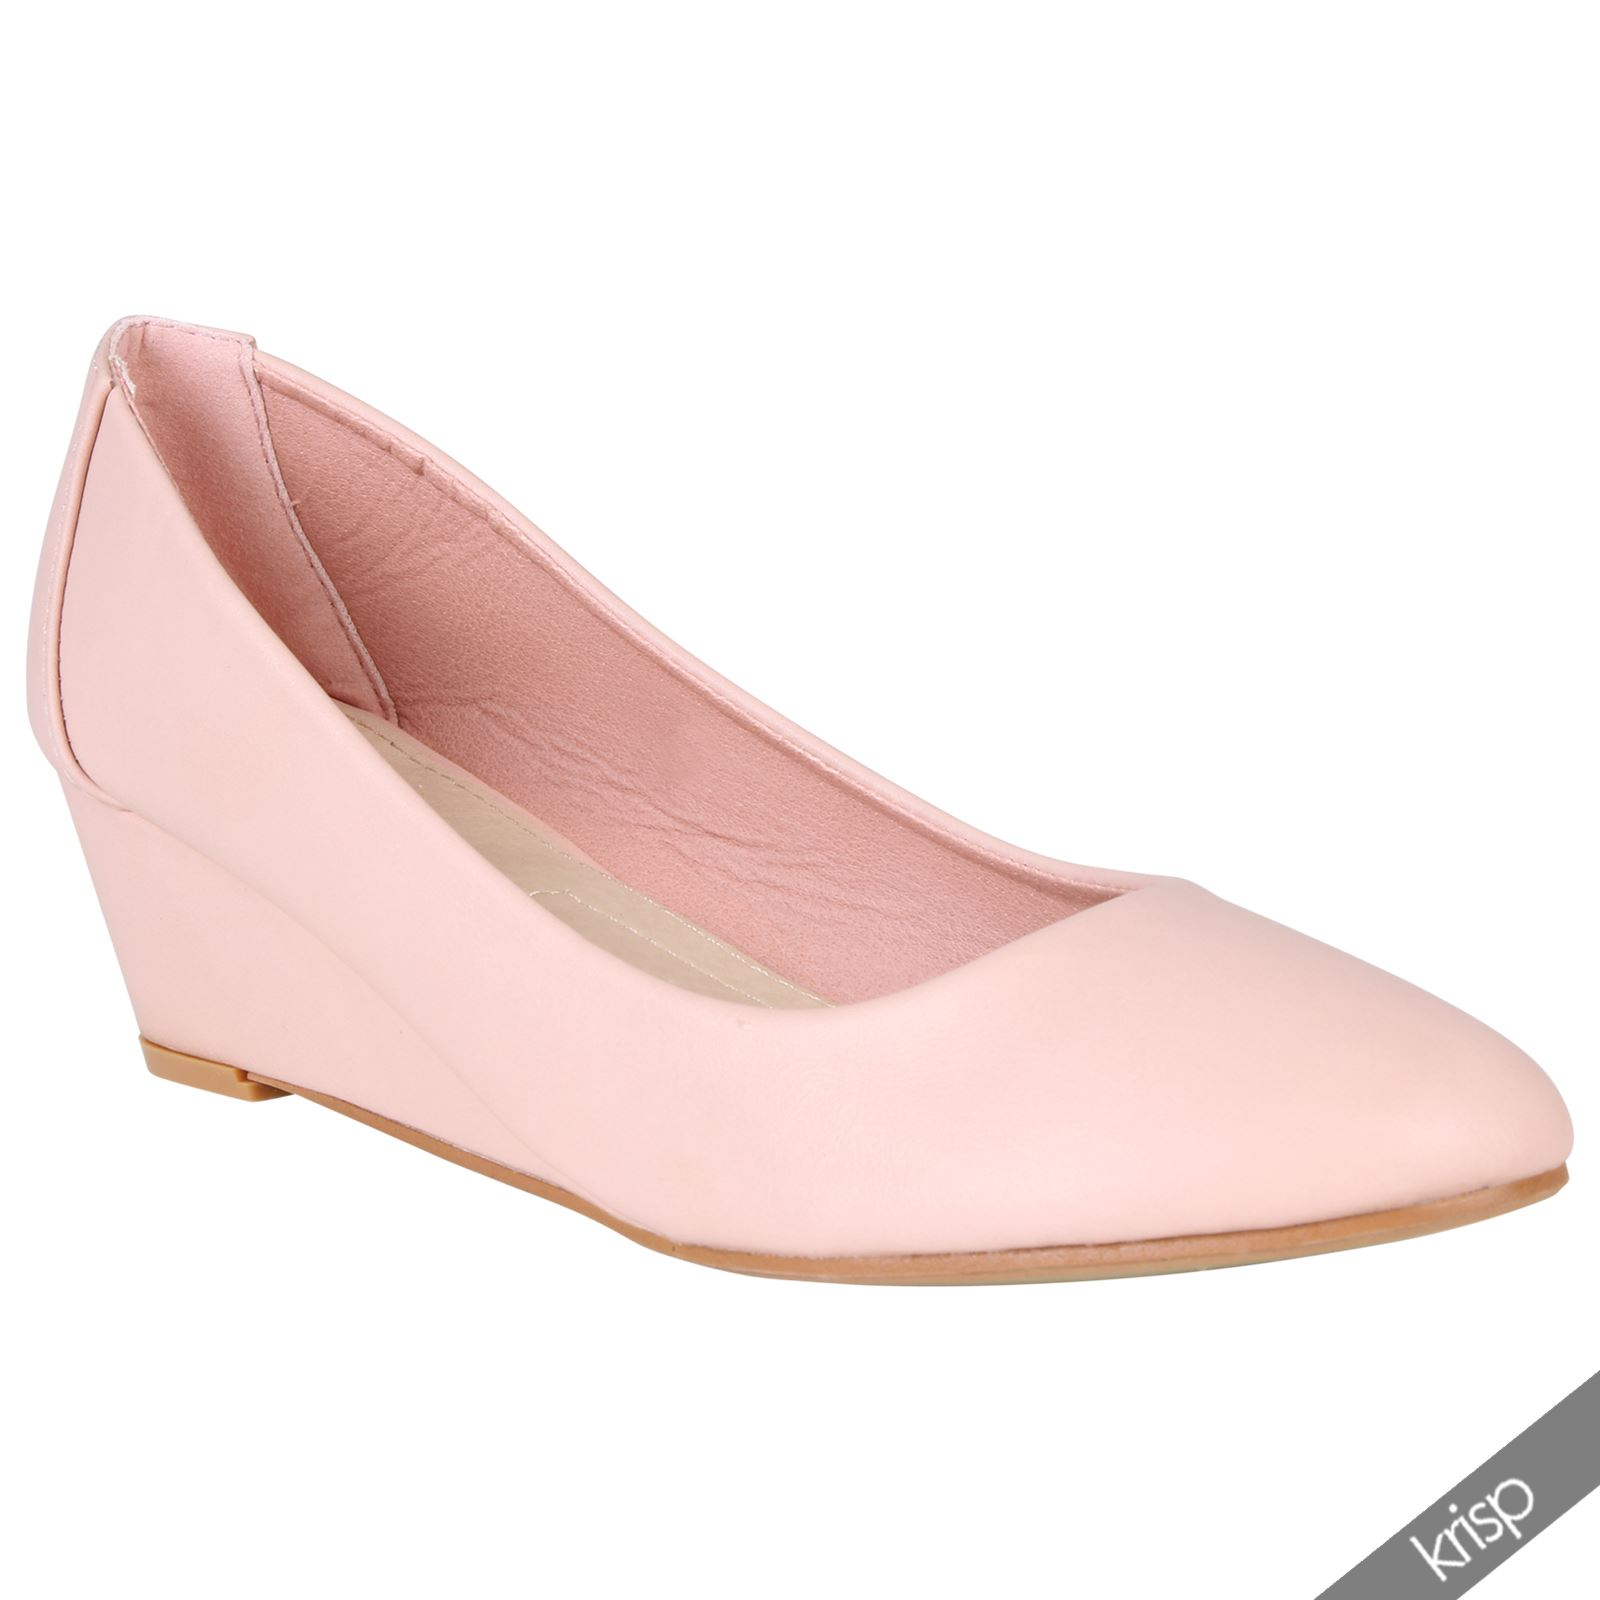 womens plain low mid high heel wedge slip on pumps court